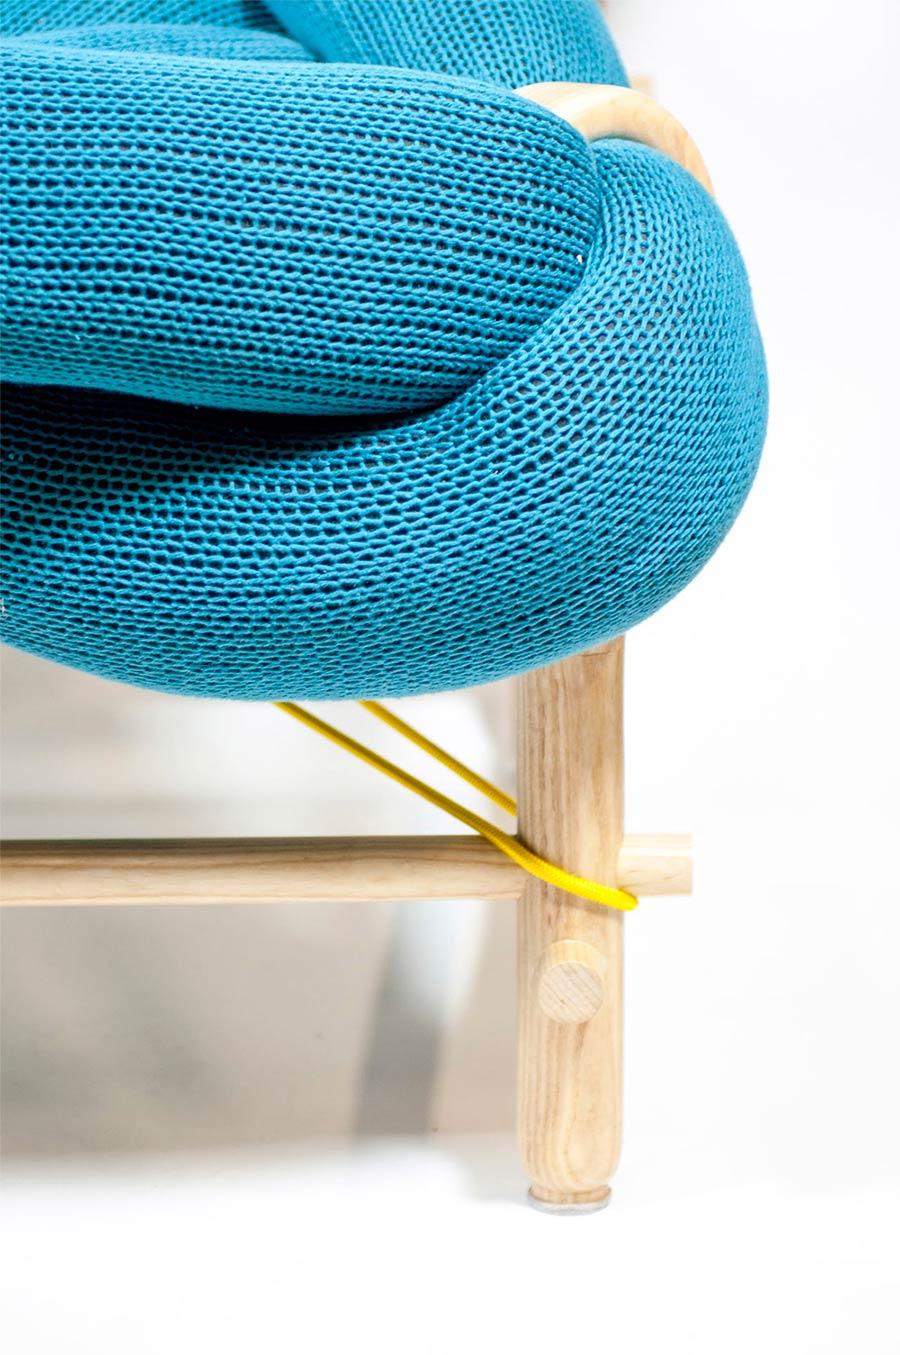 Gigantowobener Stuhl veegadesign-chunky-chair_04